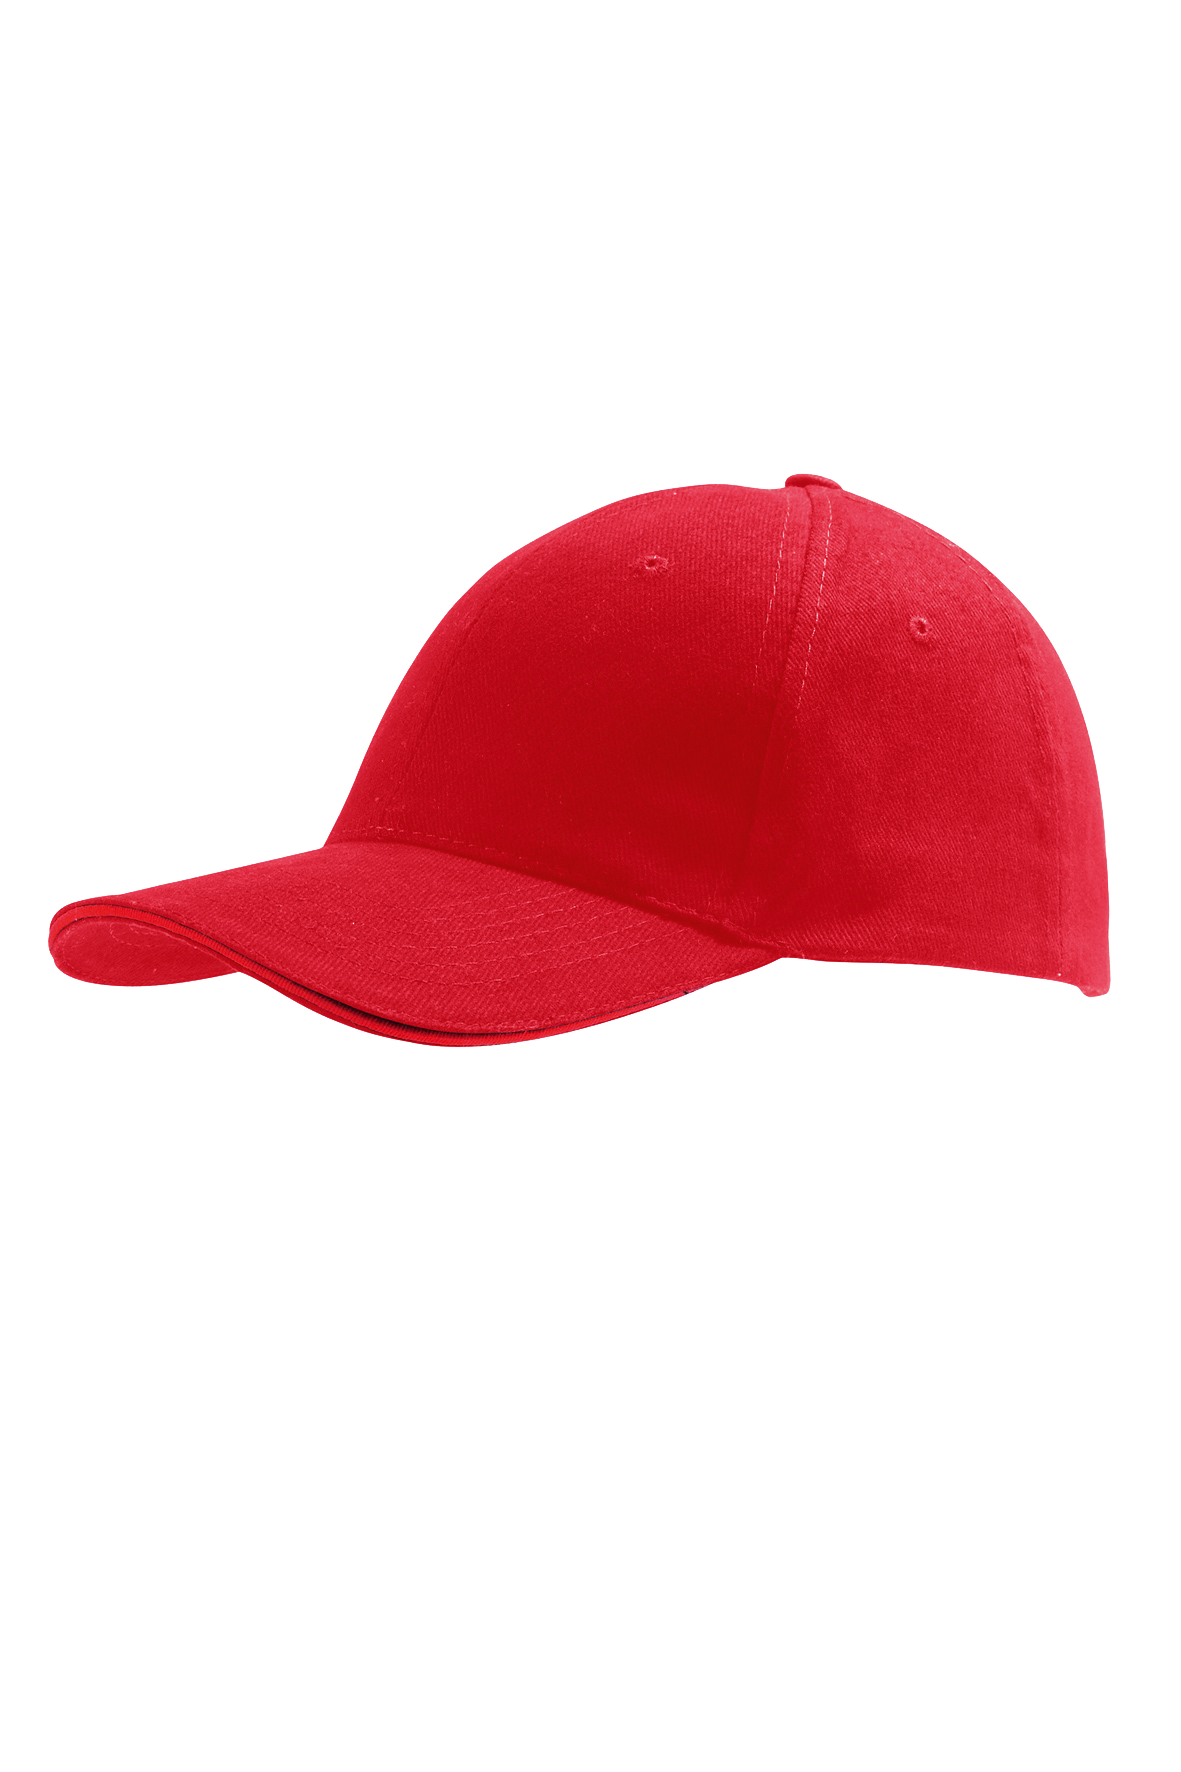 BUFFALO-88100_red_A